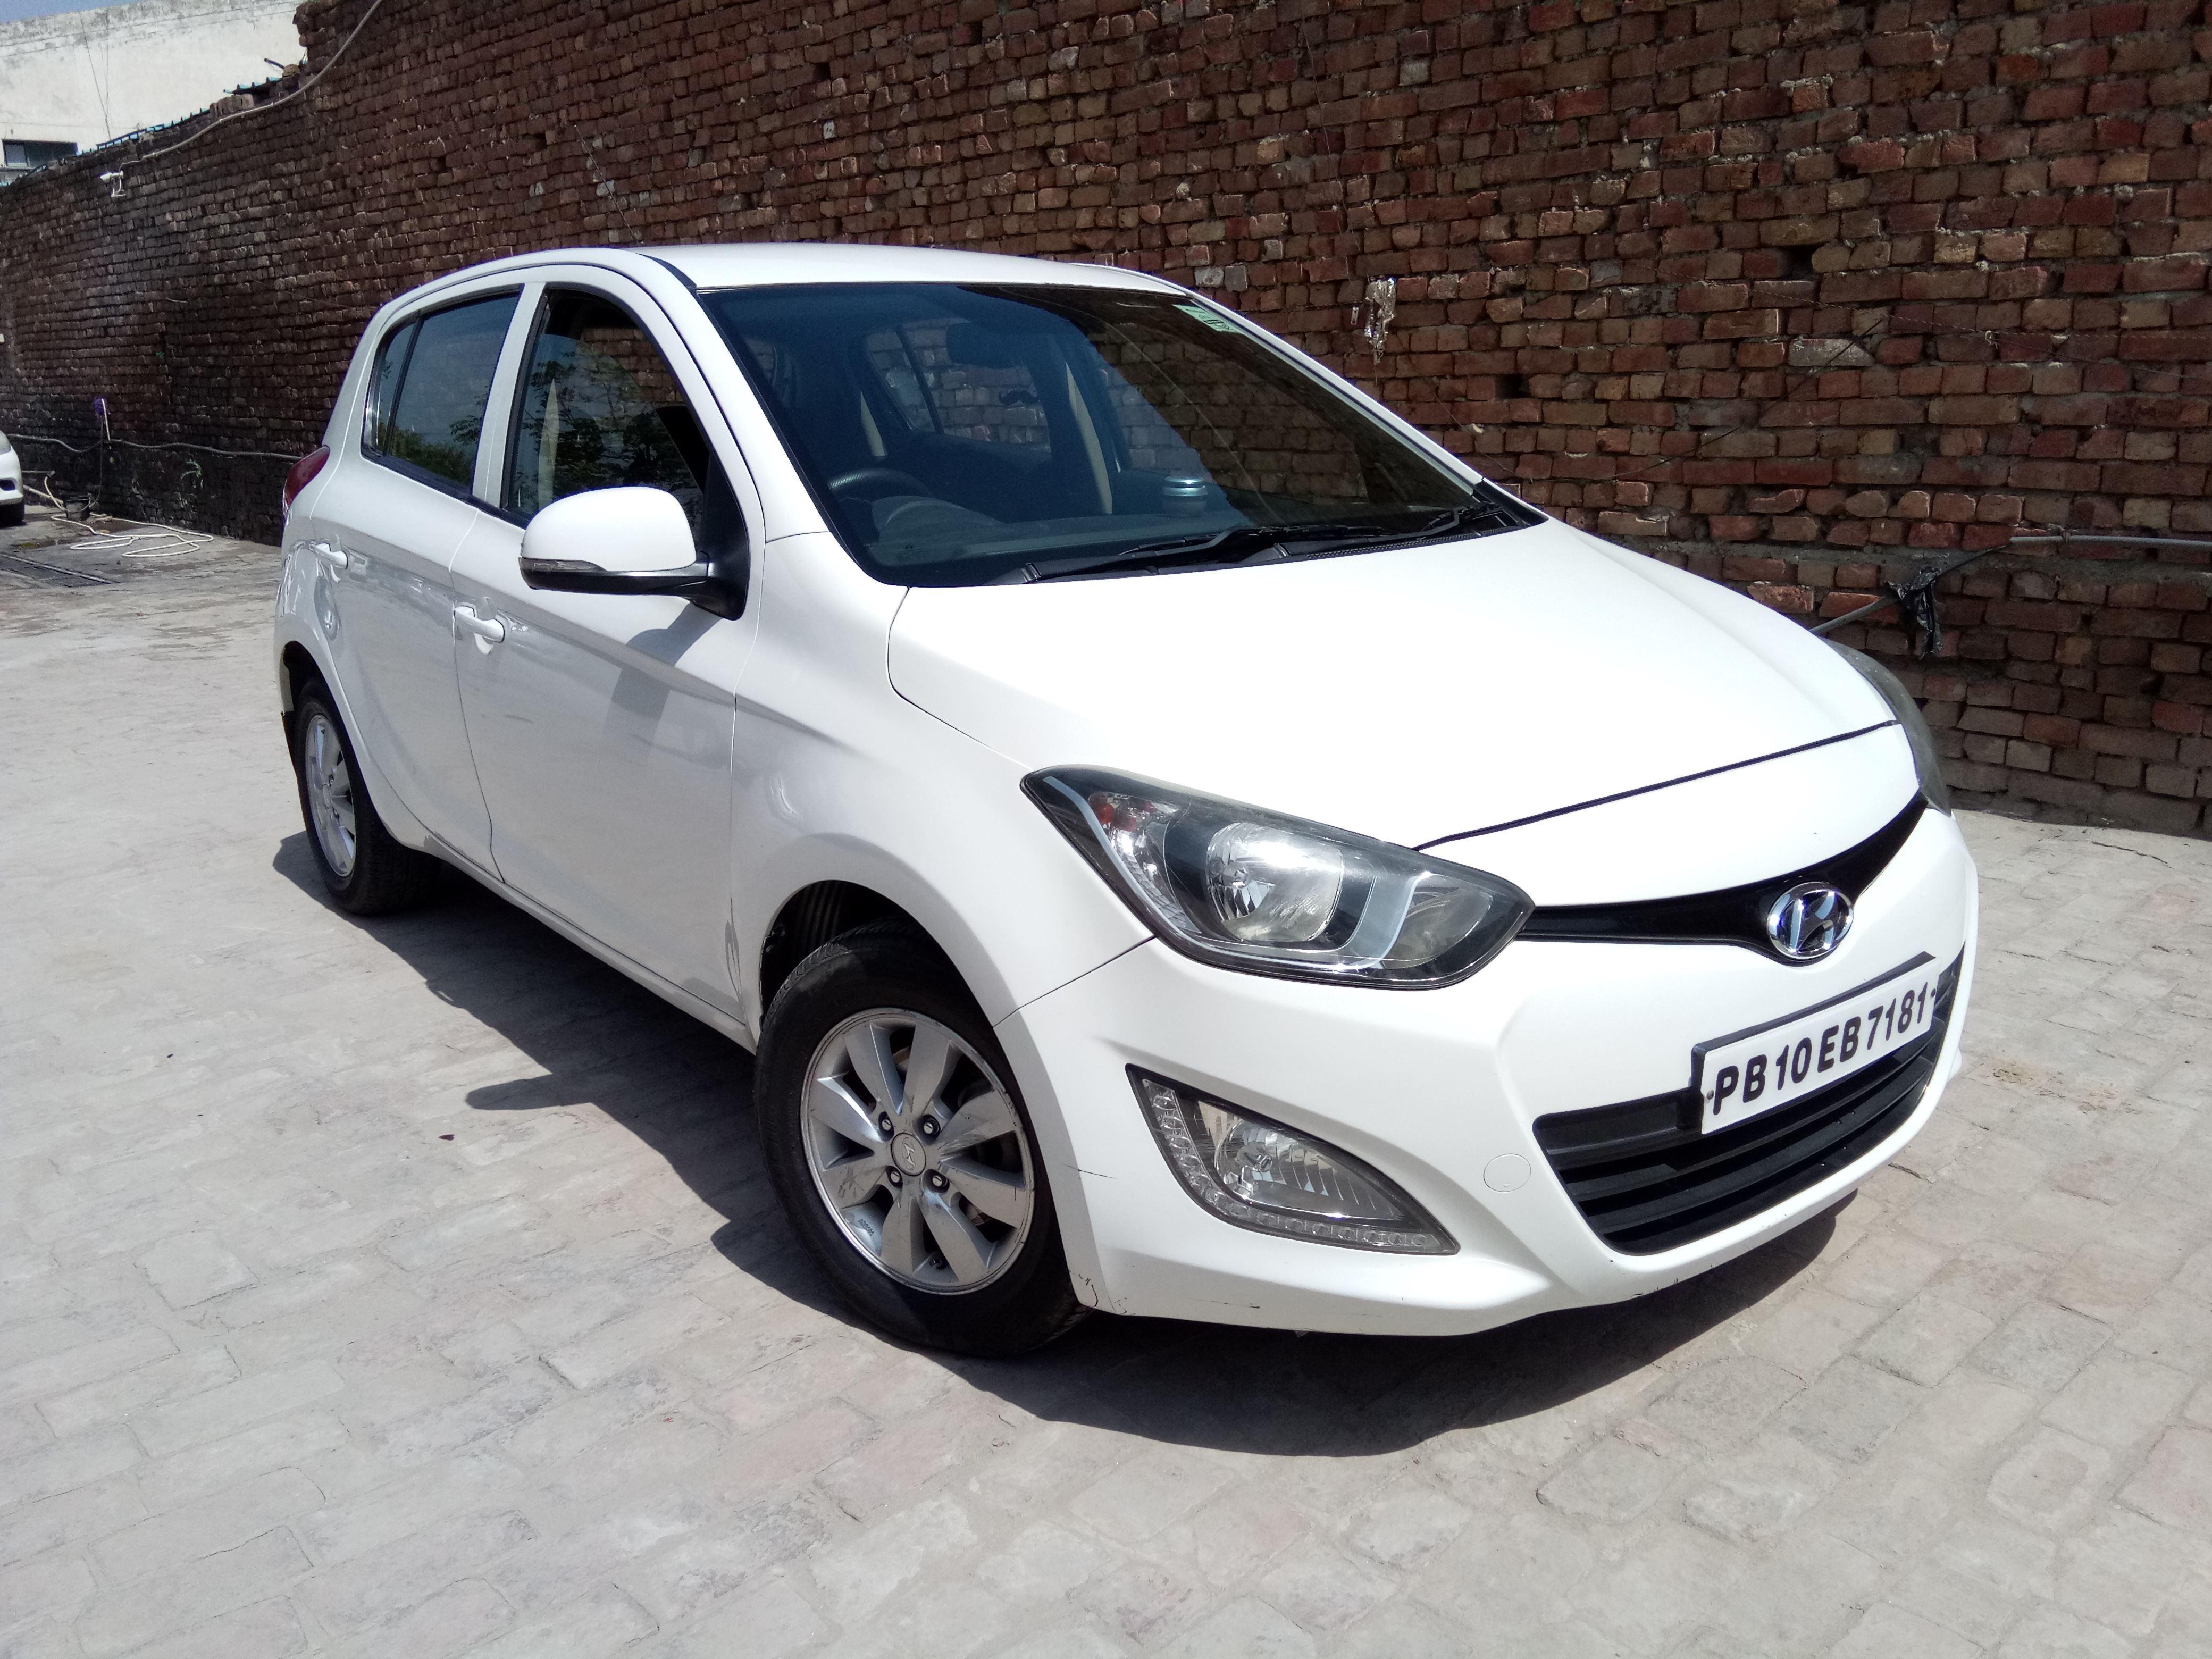 Used Cars - Second Hand Cars in Ludhiana - Mahindra First Choice Wheels